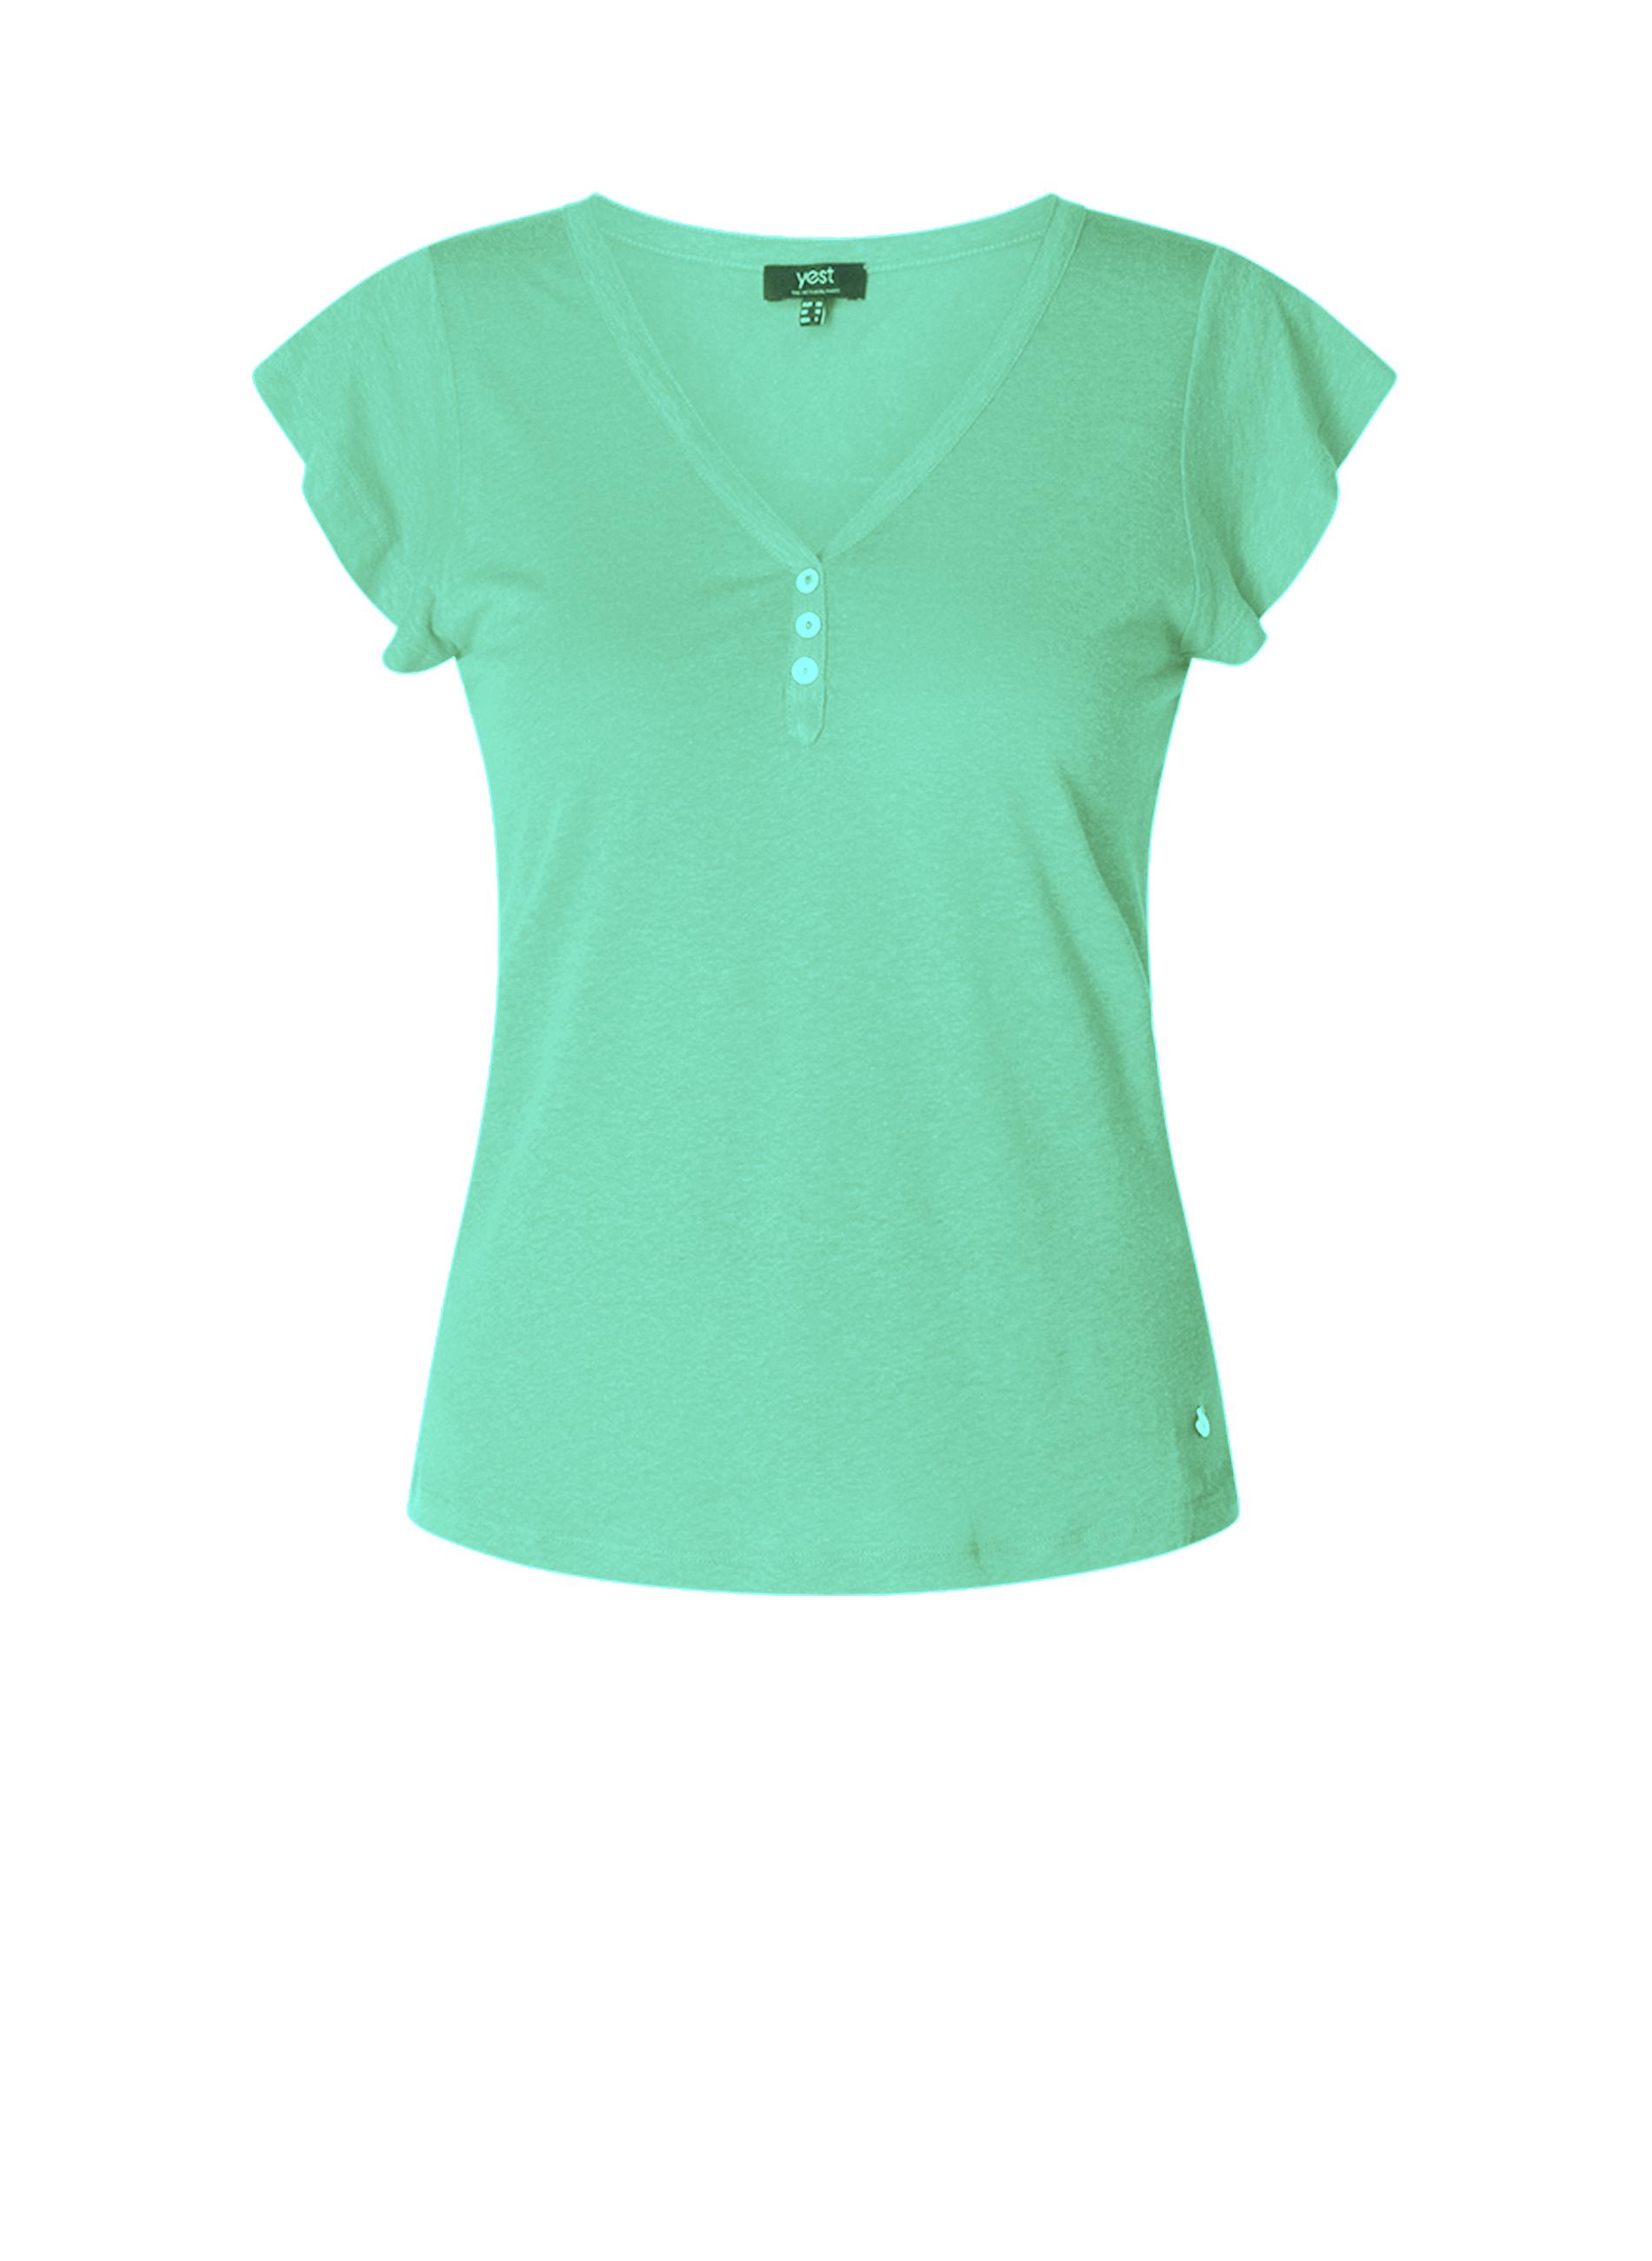 Yesta shirt Lina 75 cm